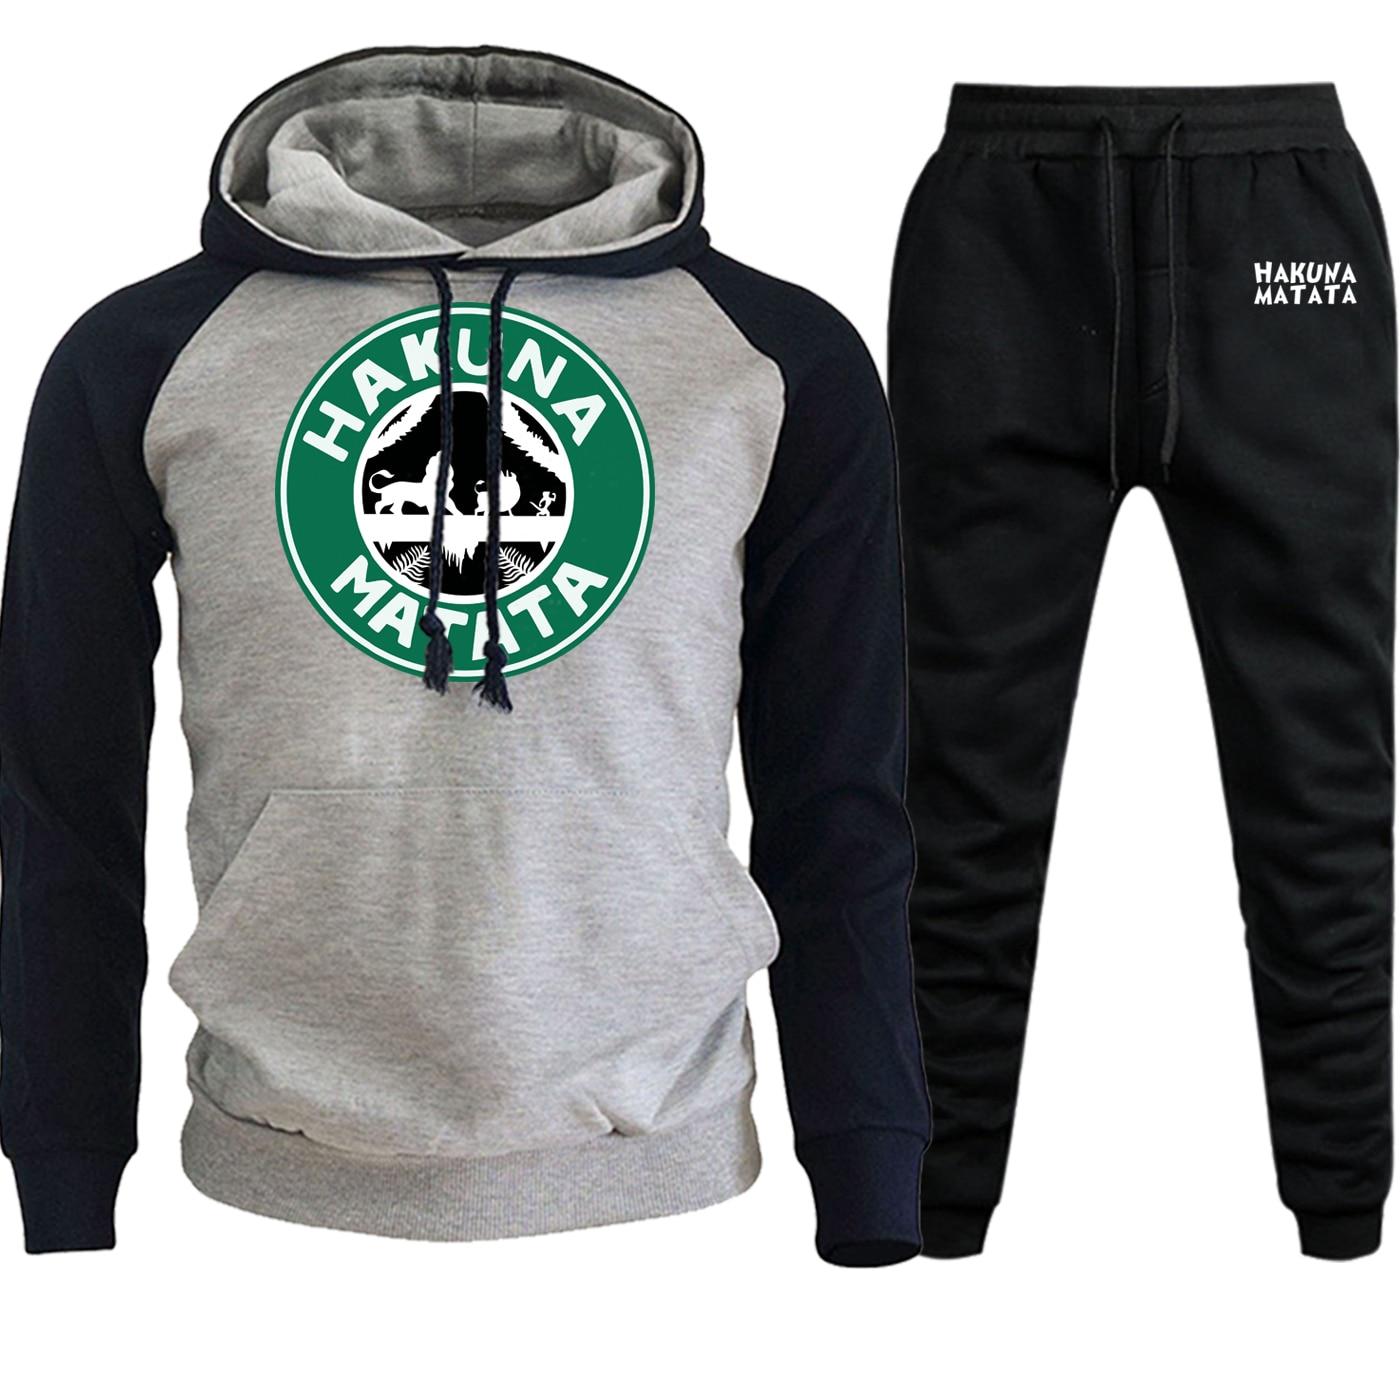 Cartoon Streetwear Mens Raglan Hooded The Lion King Sweatshirts 2019 Autumn Winter Fleece Suit Male Pullover+Pants 2 Piece Set